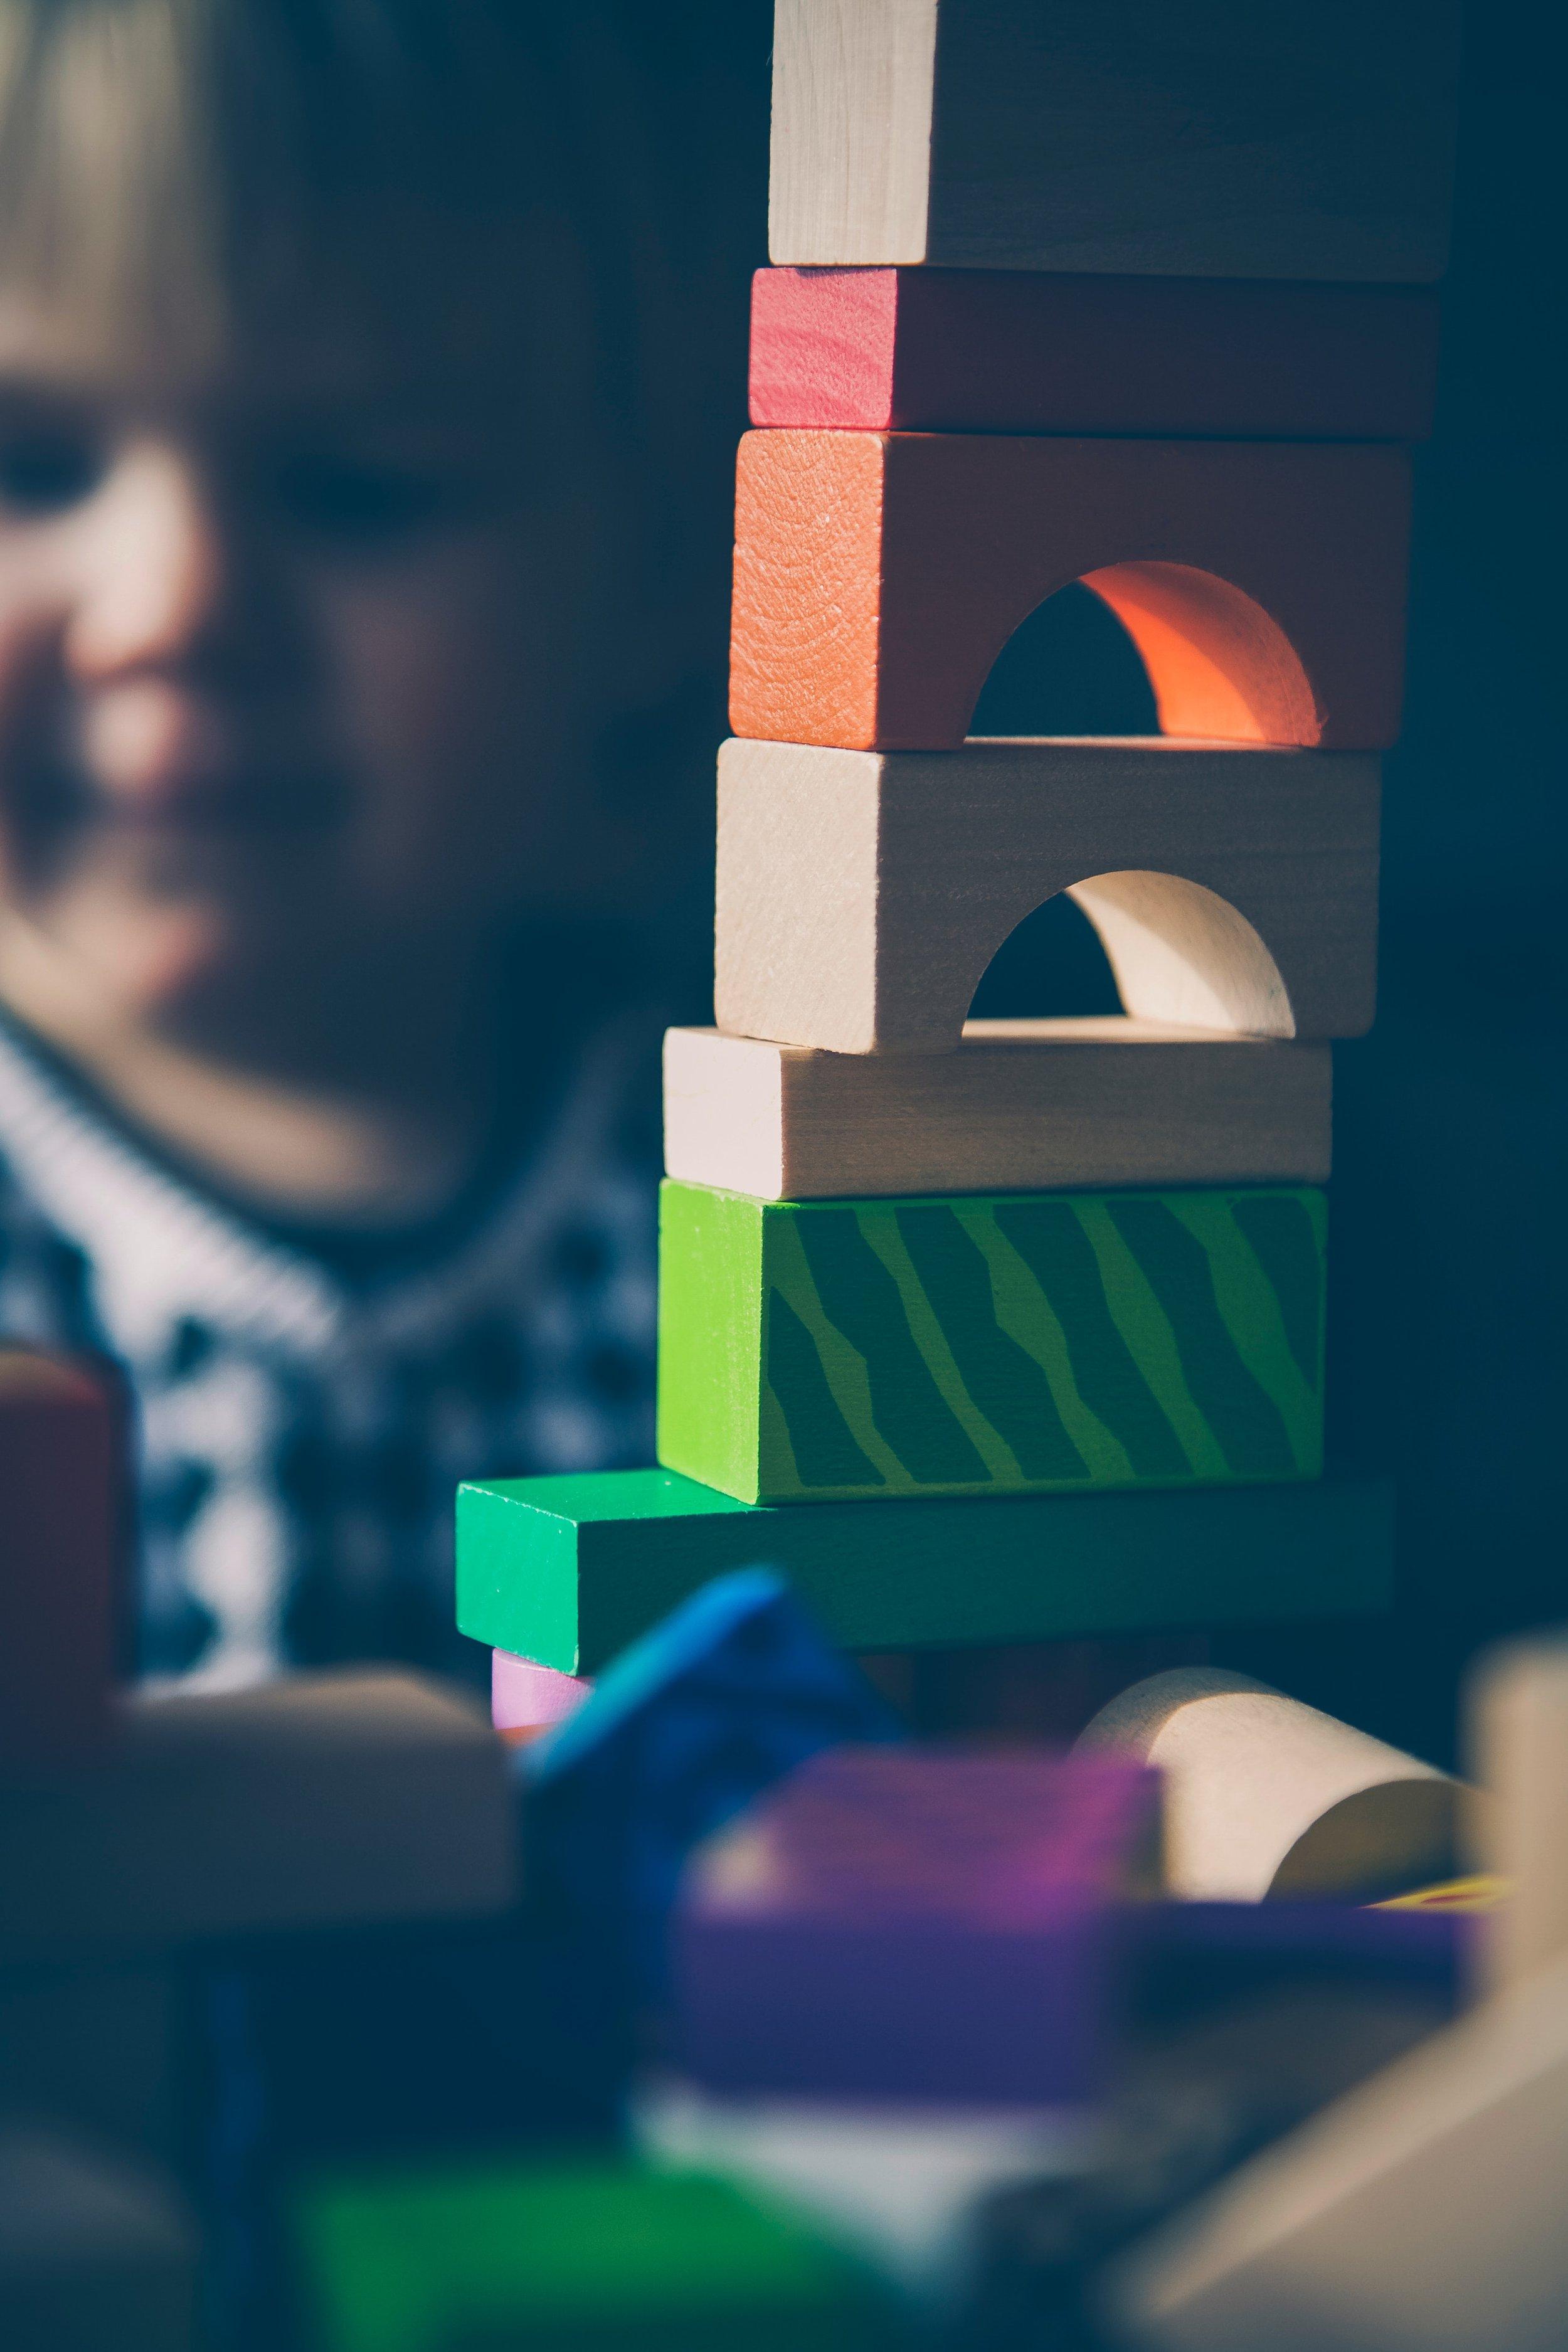 blocks-child-colorful-105855.jpg